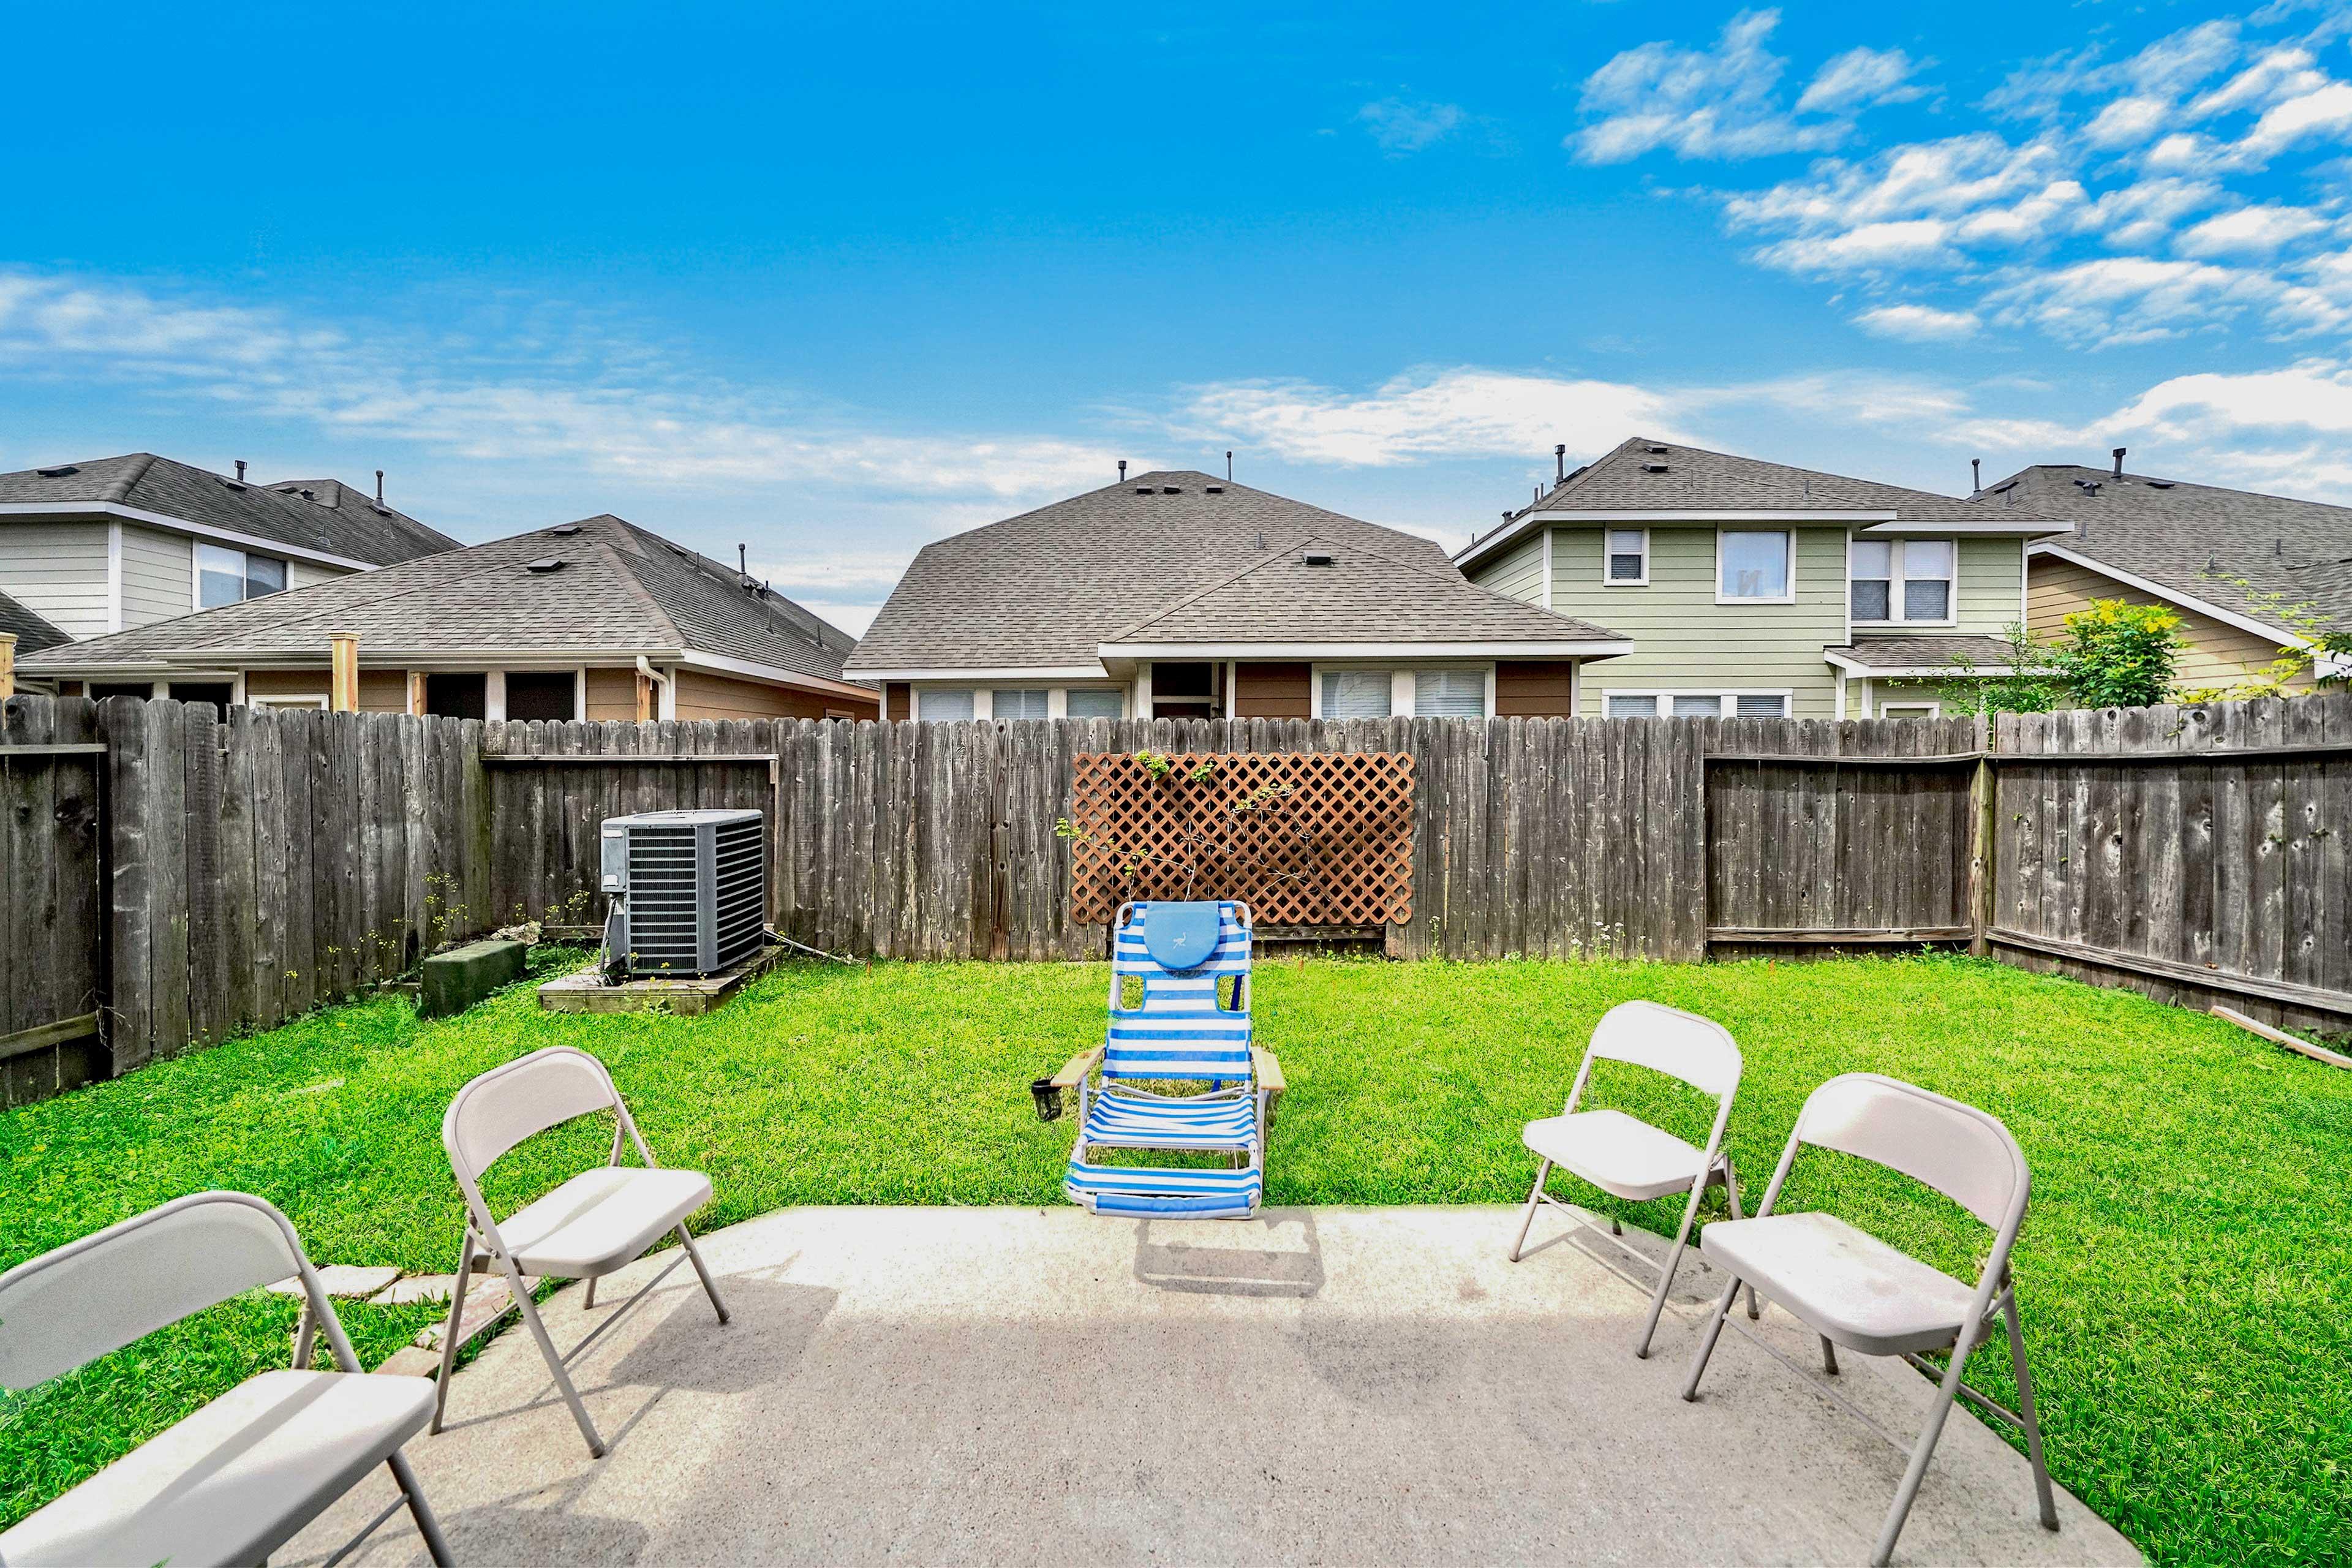 Host summer parties in the backyard!